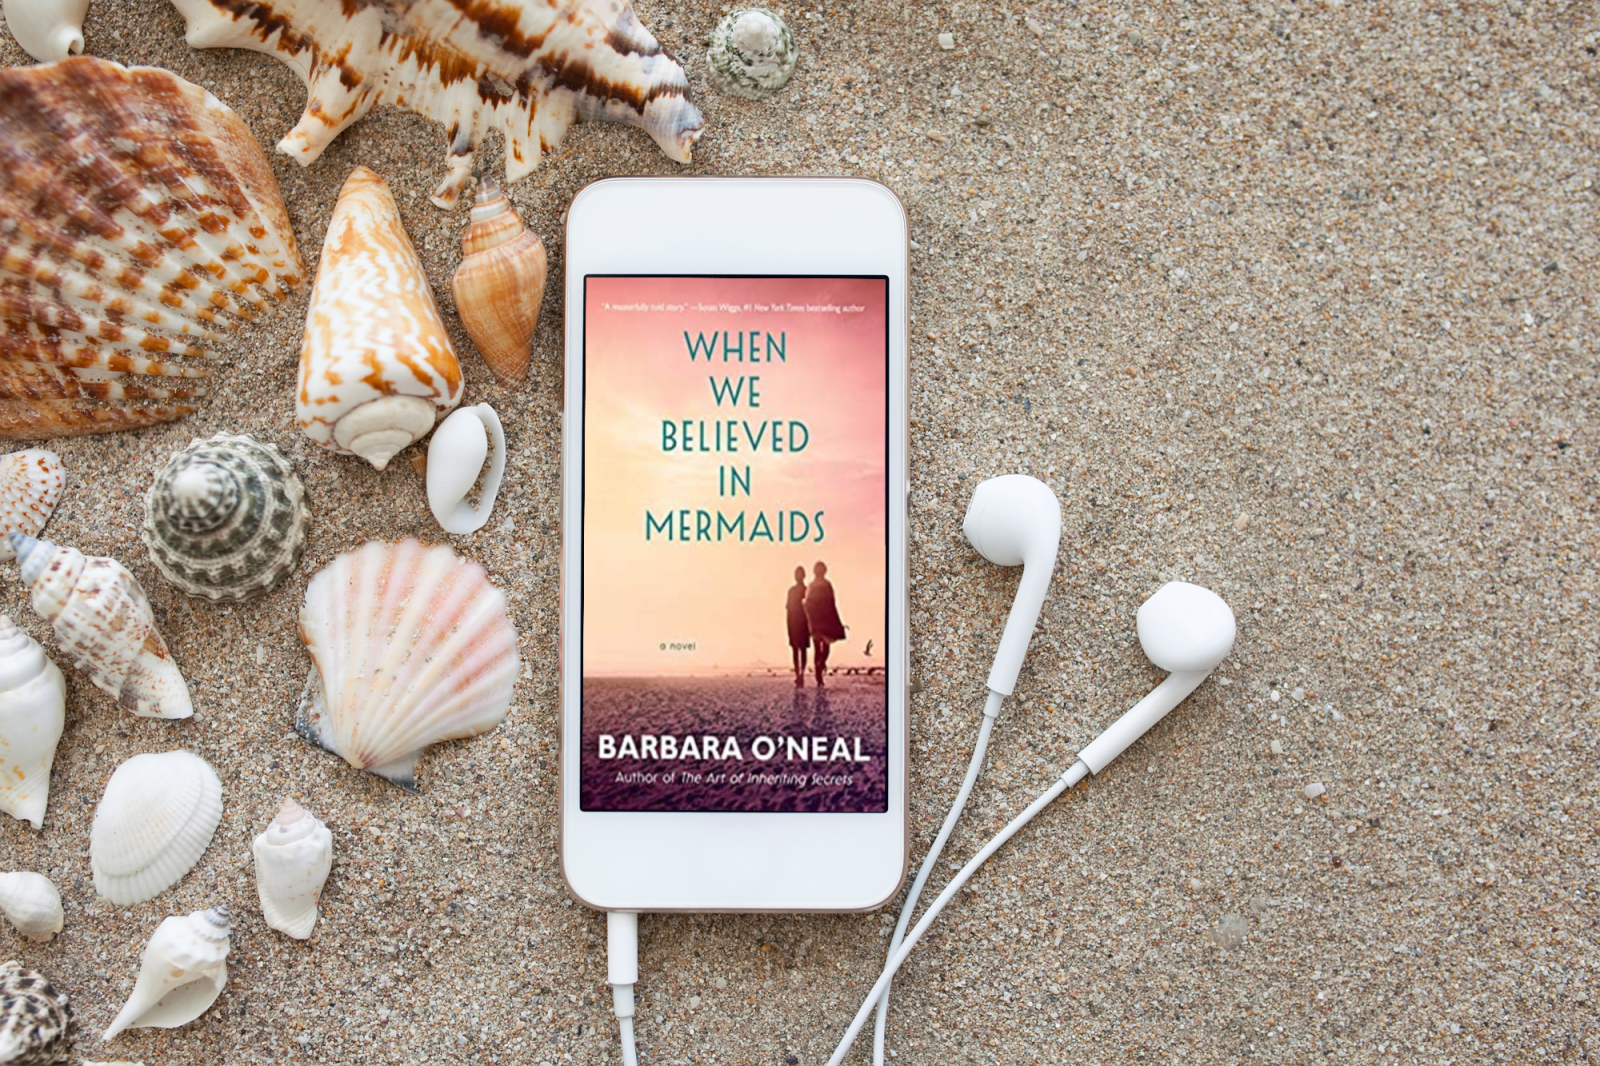 When We Believed in Mermaids audiobook